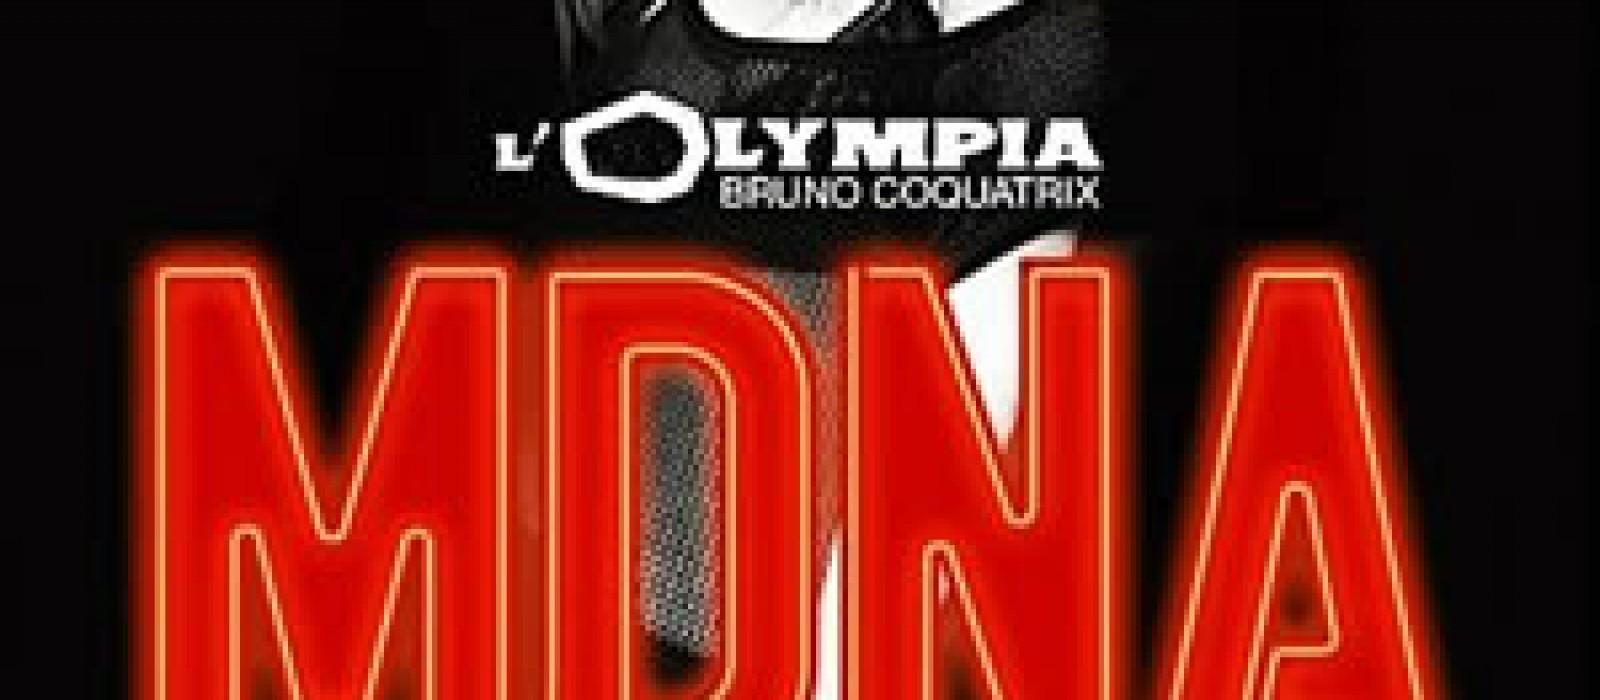 MDNA Tour 2012 de Madonna à l'Olympia